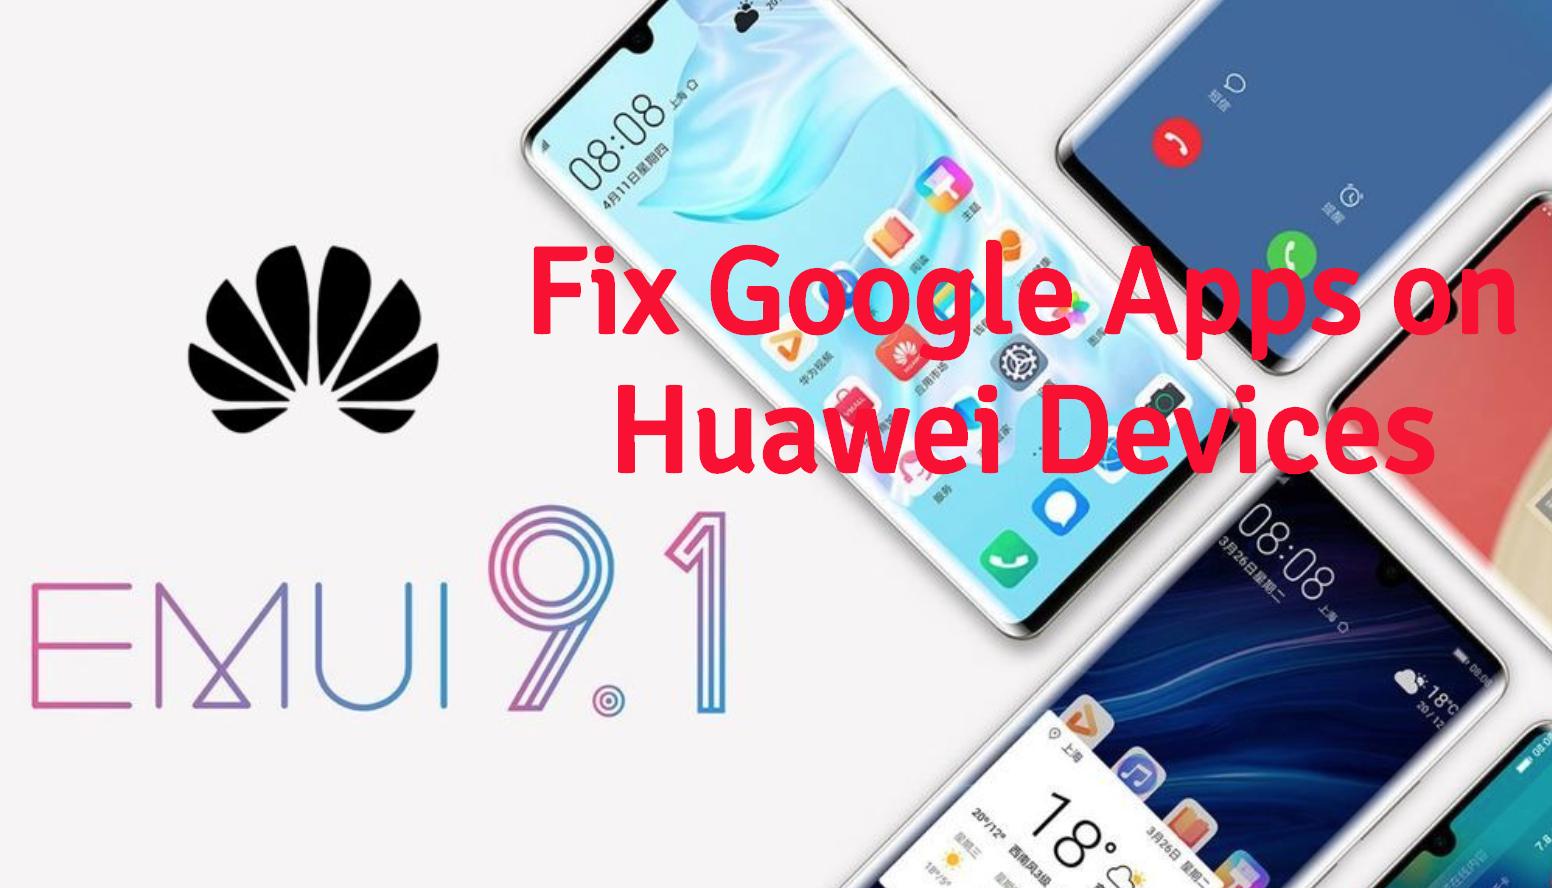 Fix Google Apps on Huawei